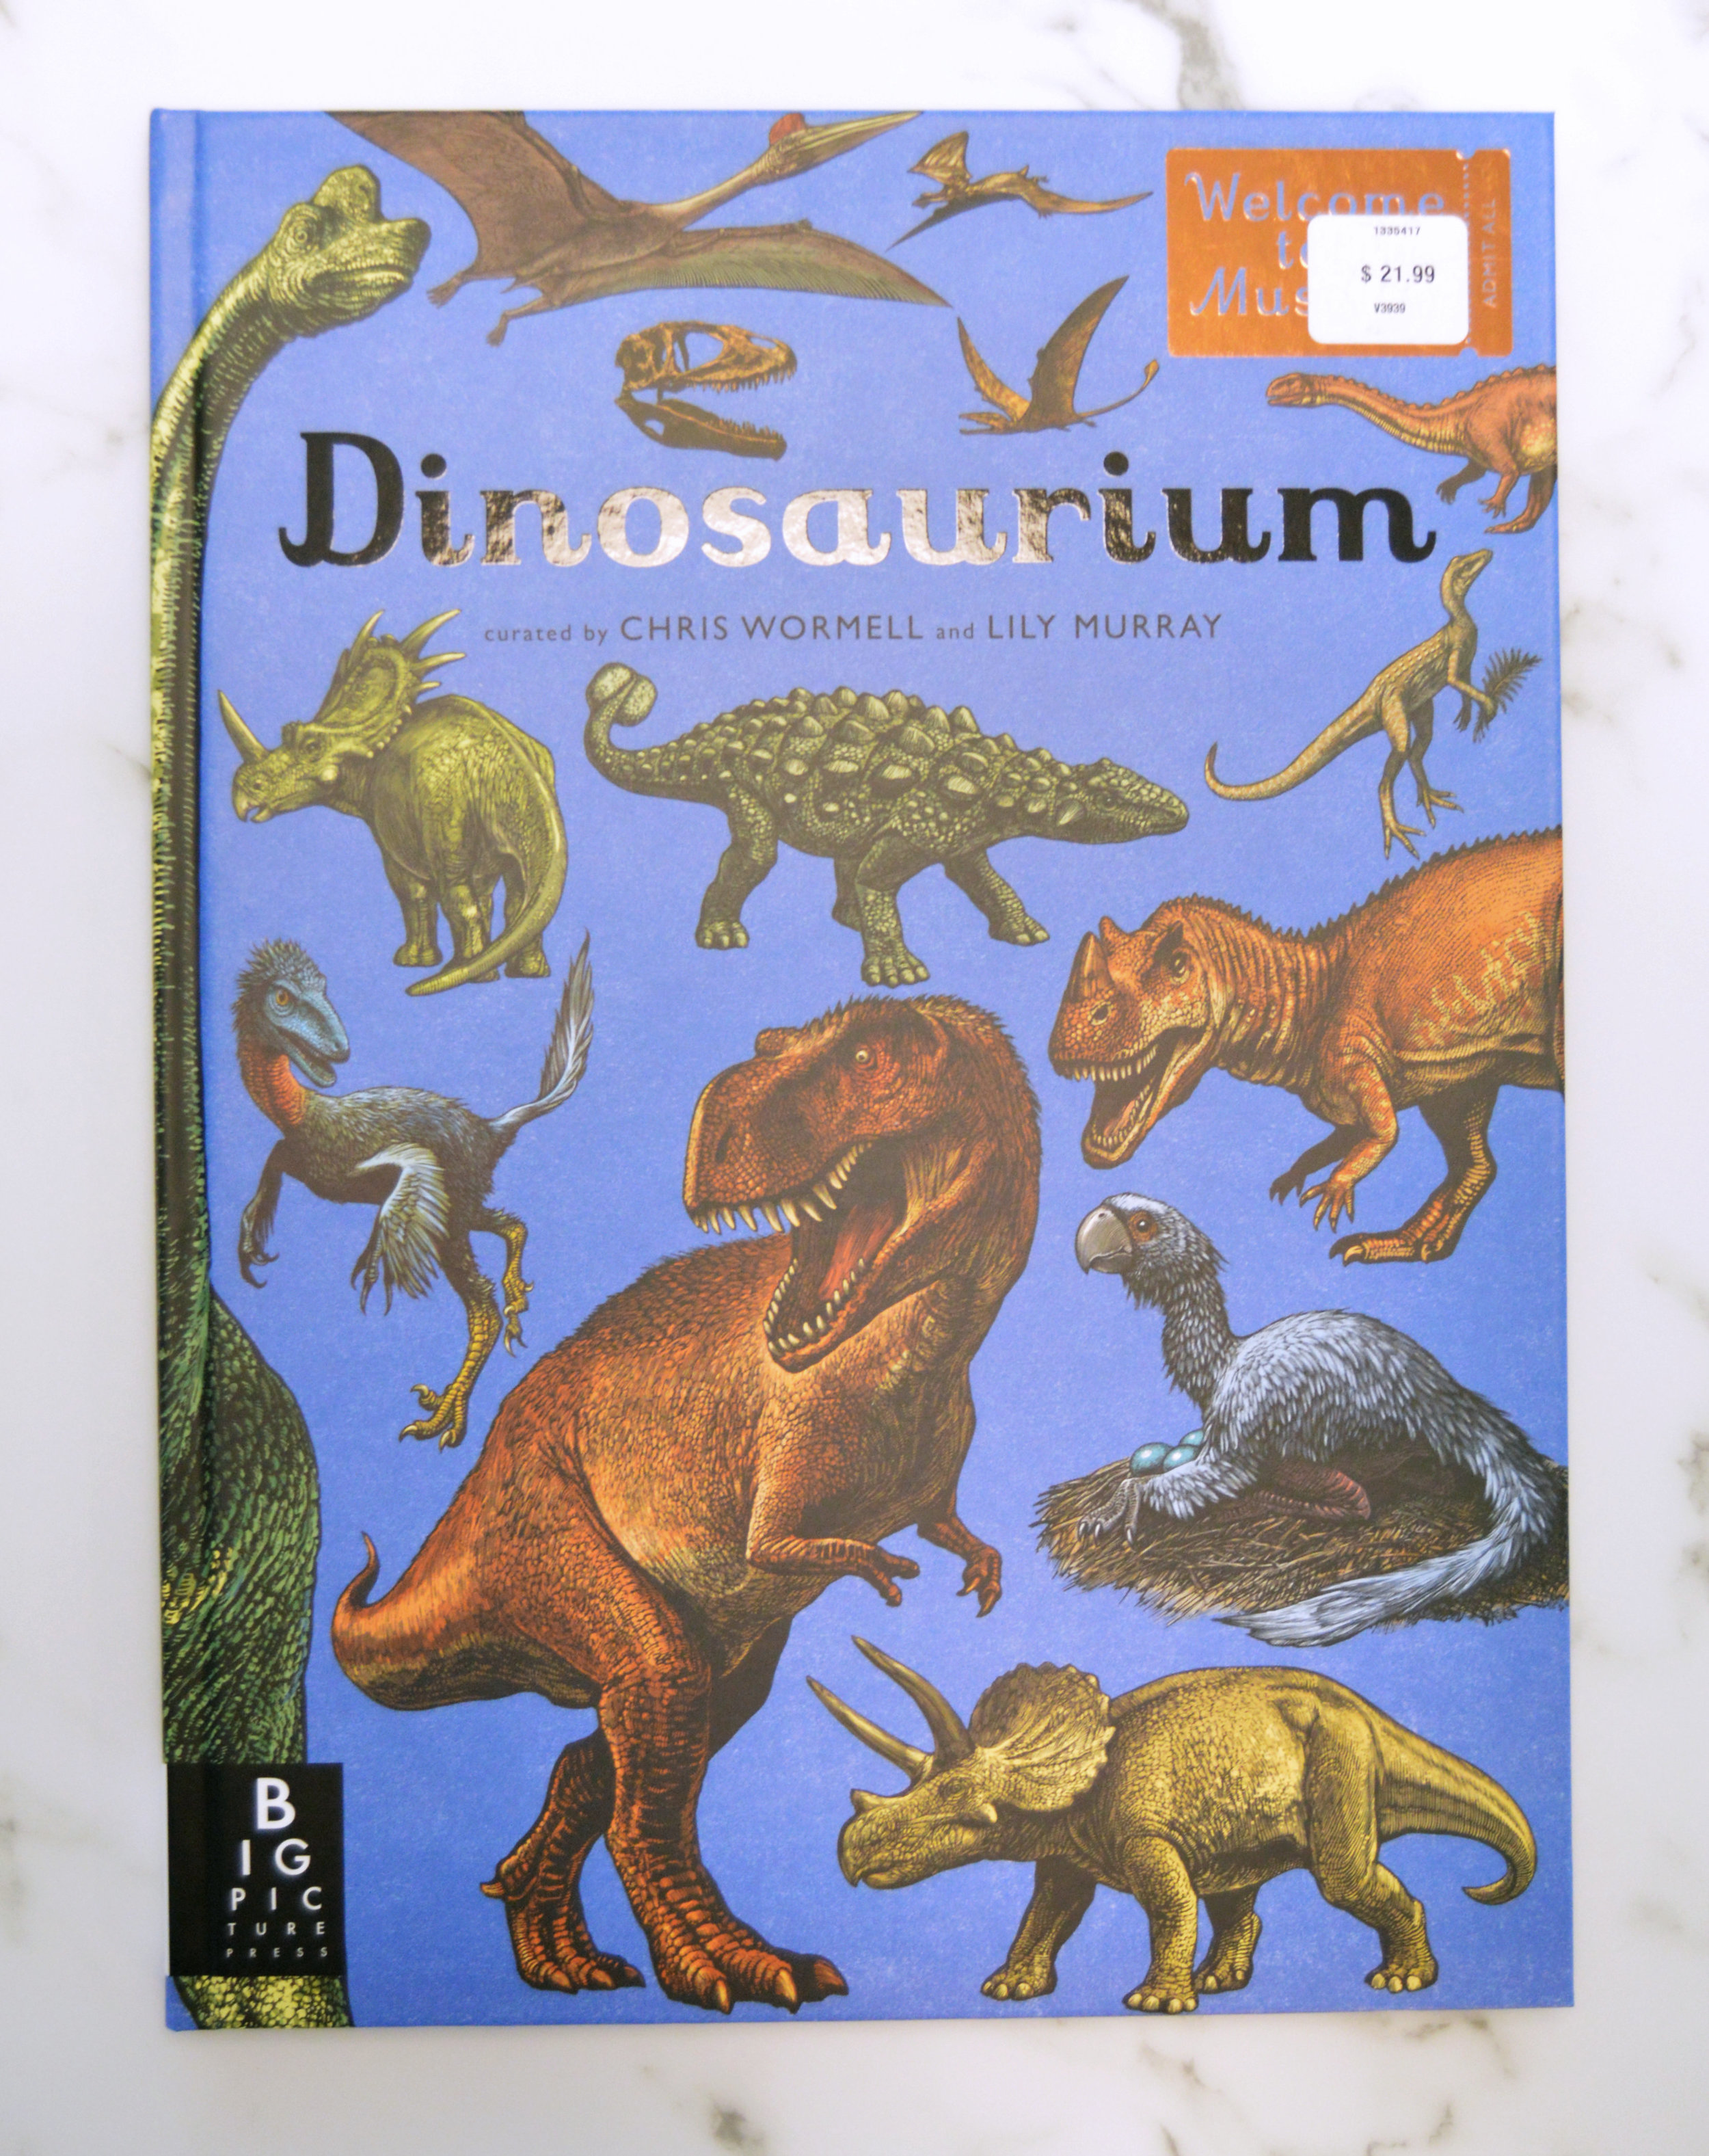 Dino Book Cover.jpg